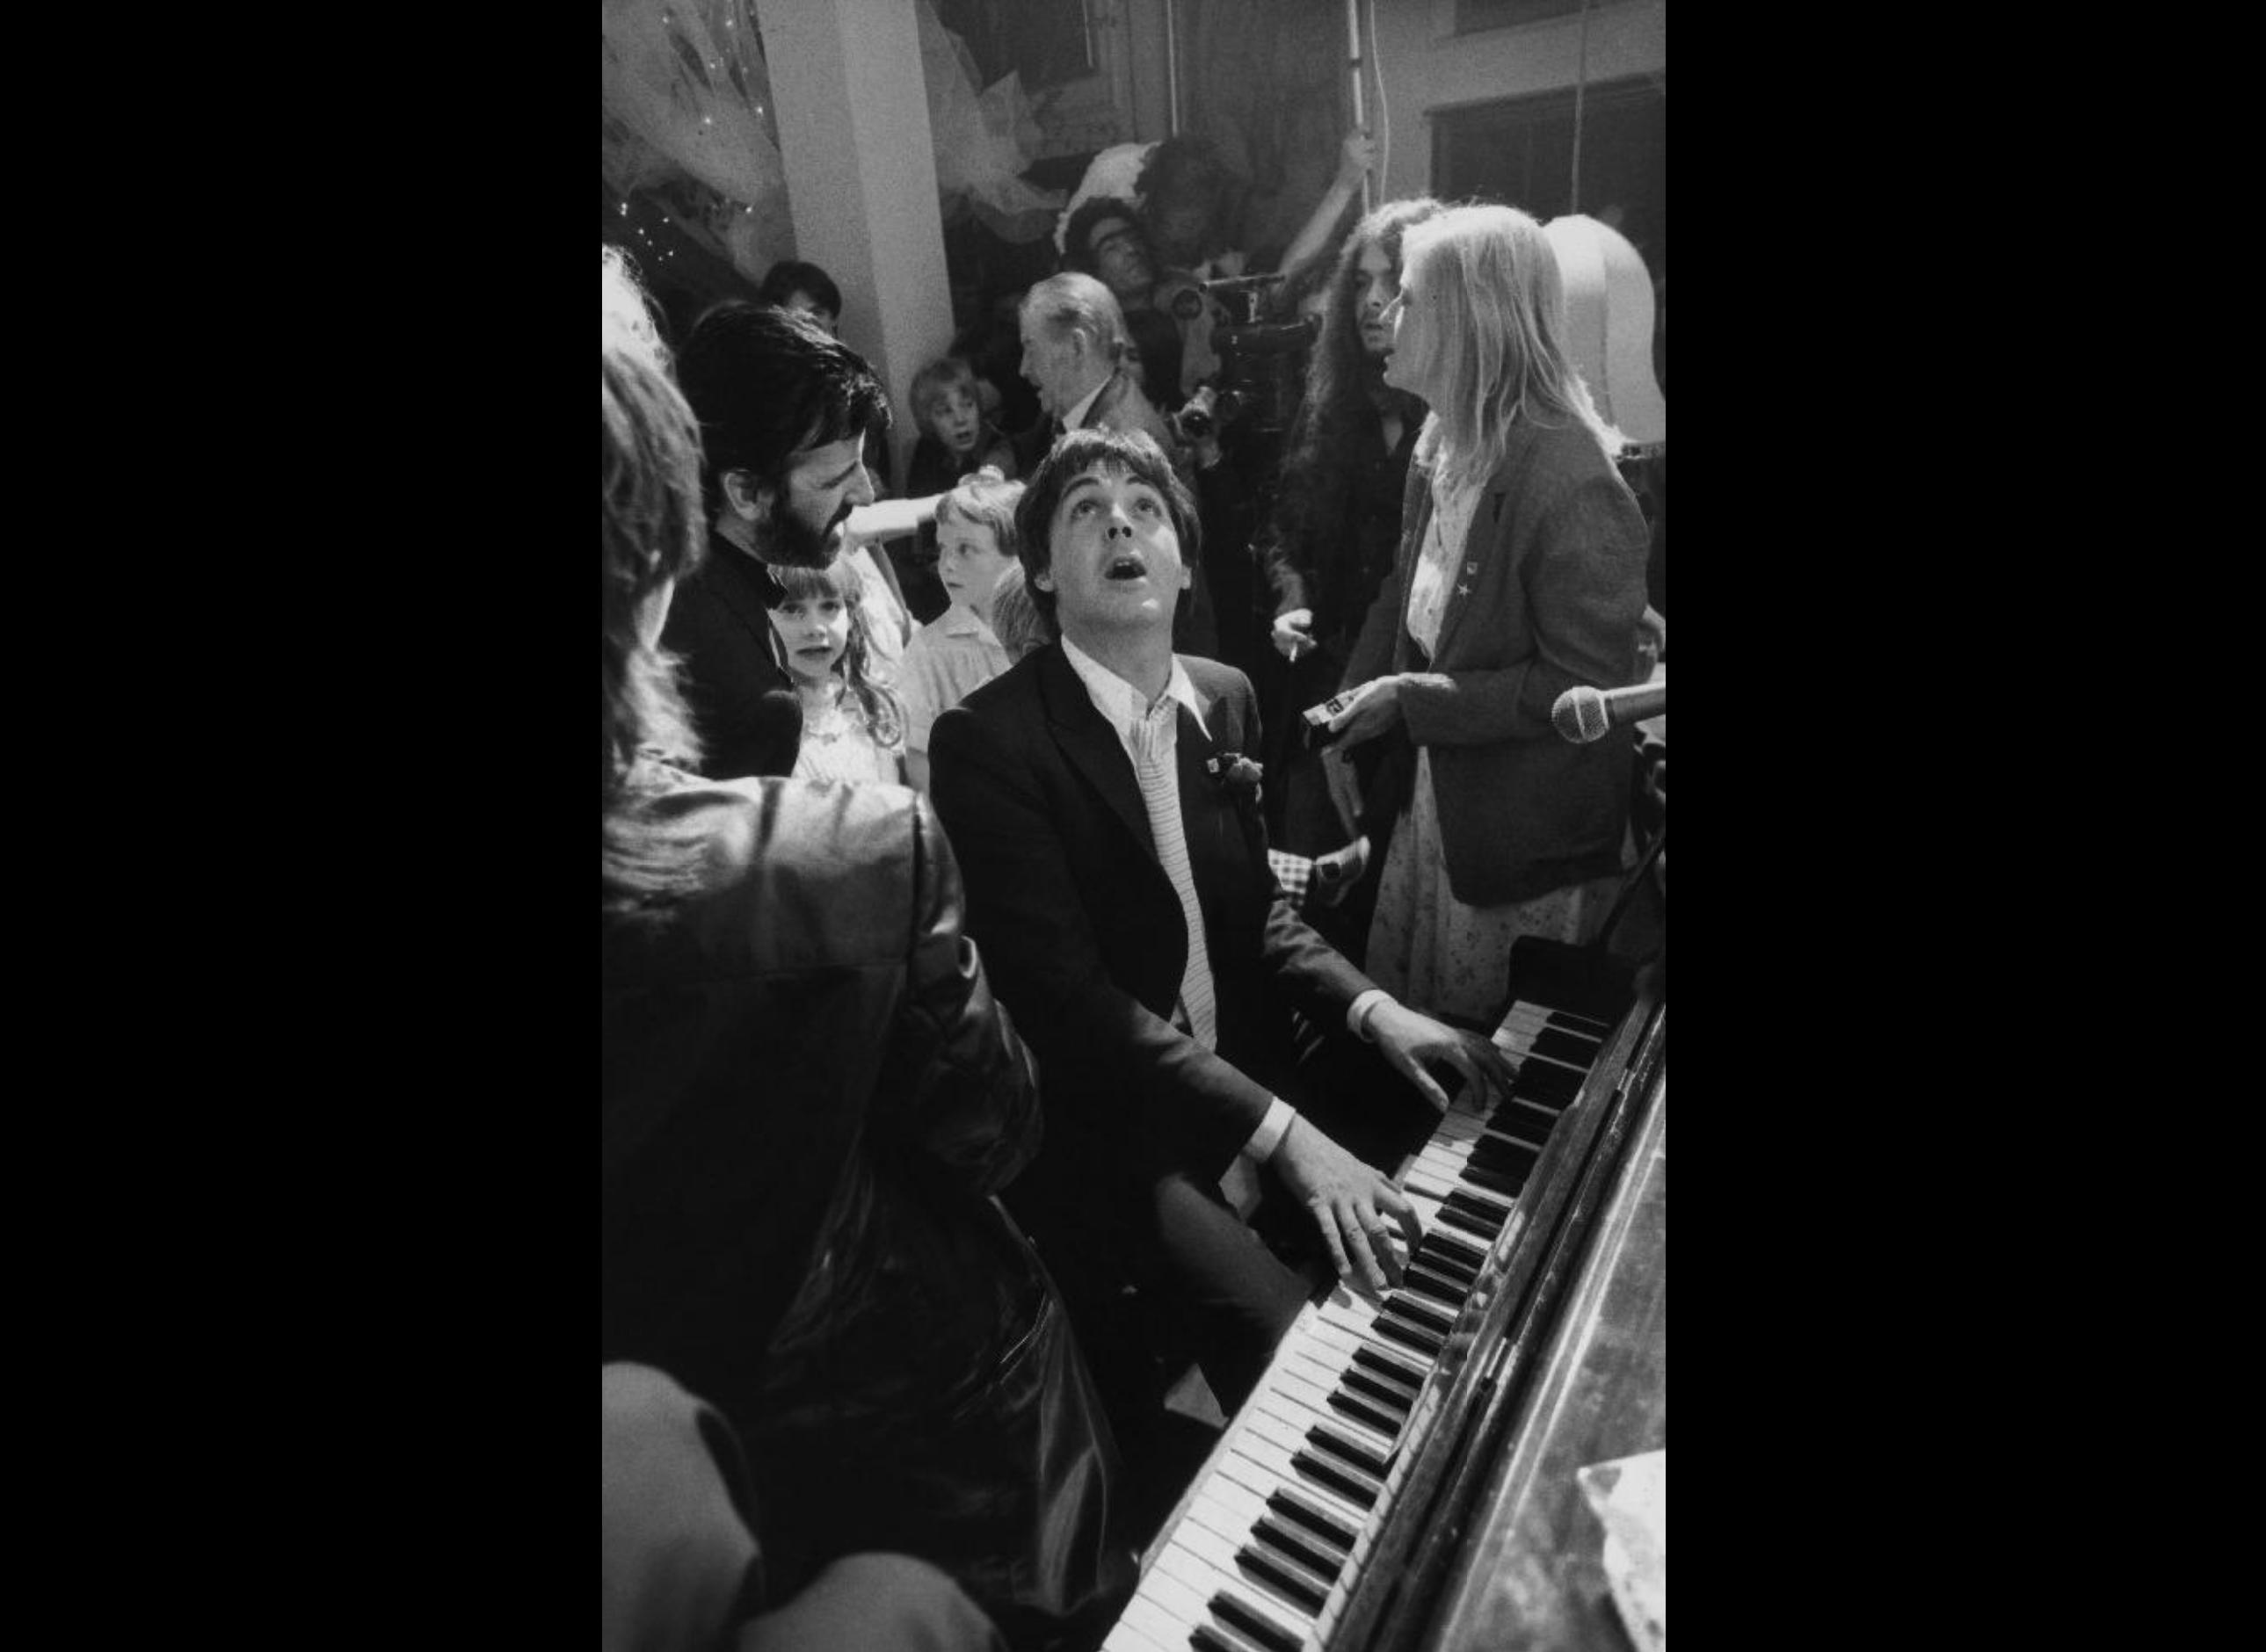 Paul McCartney at Ringo Starr's Wedding by Terry O'Neill